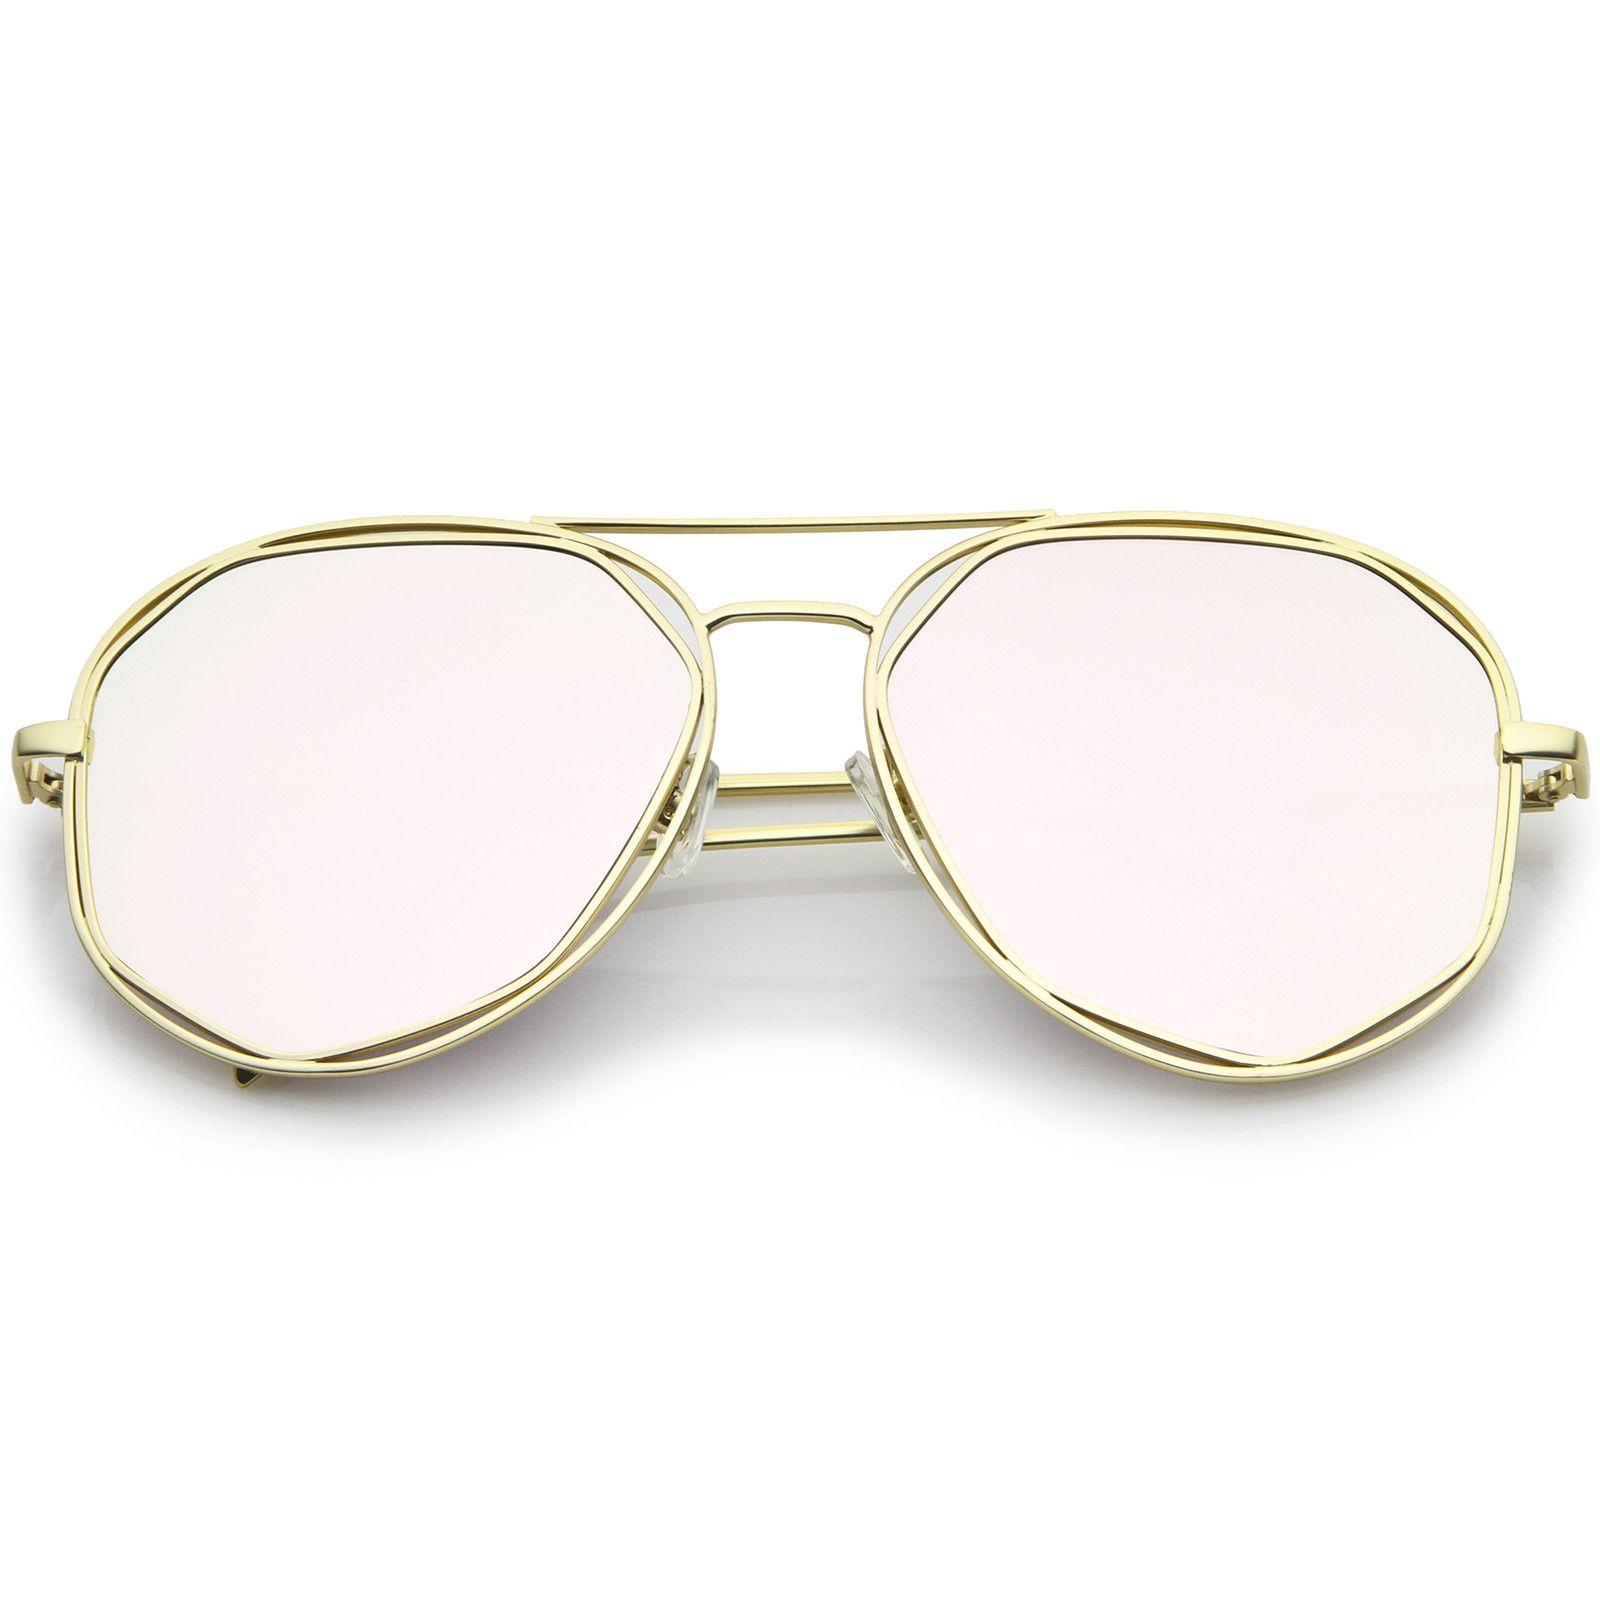 468de1567b3 Geometric Hexagonal Metal Frame Colored Mirror Flat Lens Aviator Sunglasses  60mm  sunglass  frame  sunglasses  purple  mirrored  clear  oversized   cateye ...